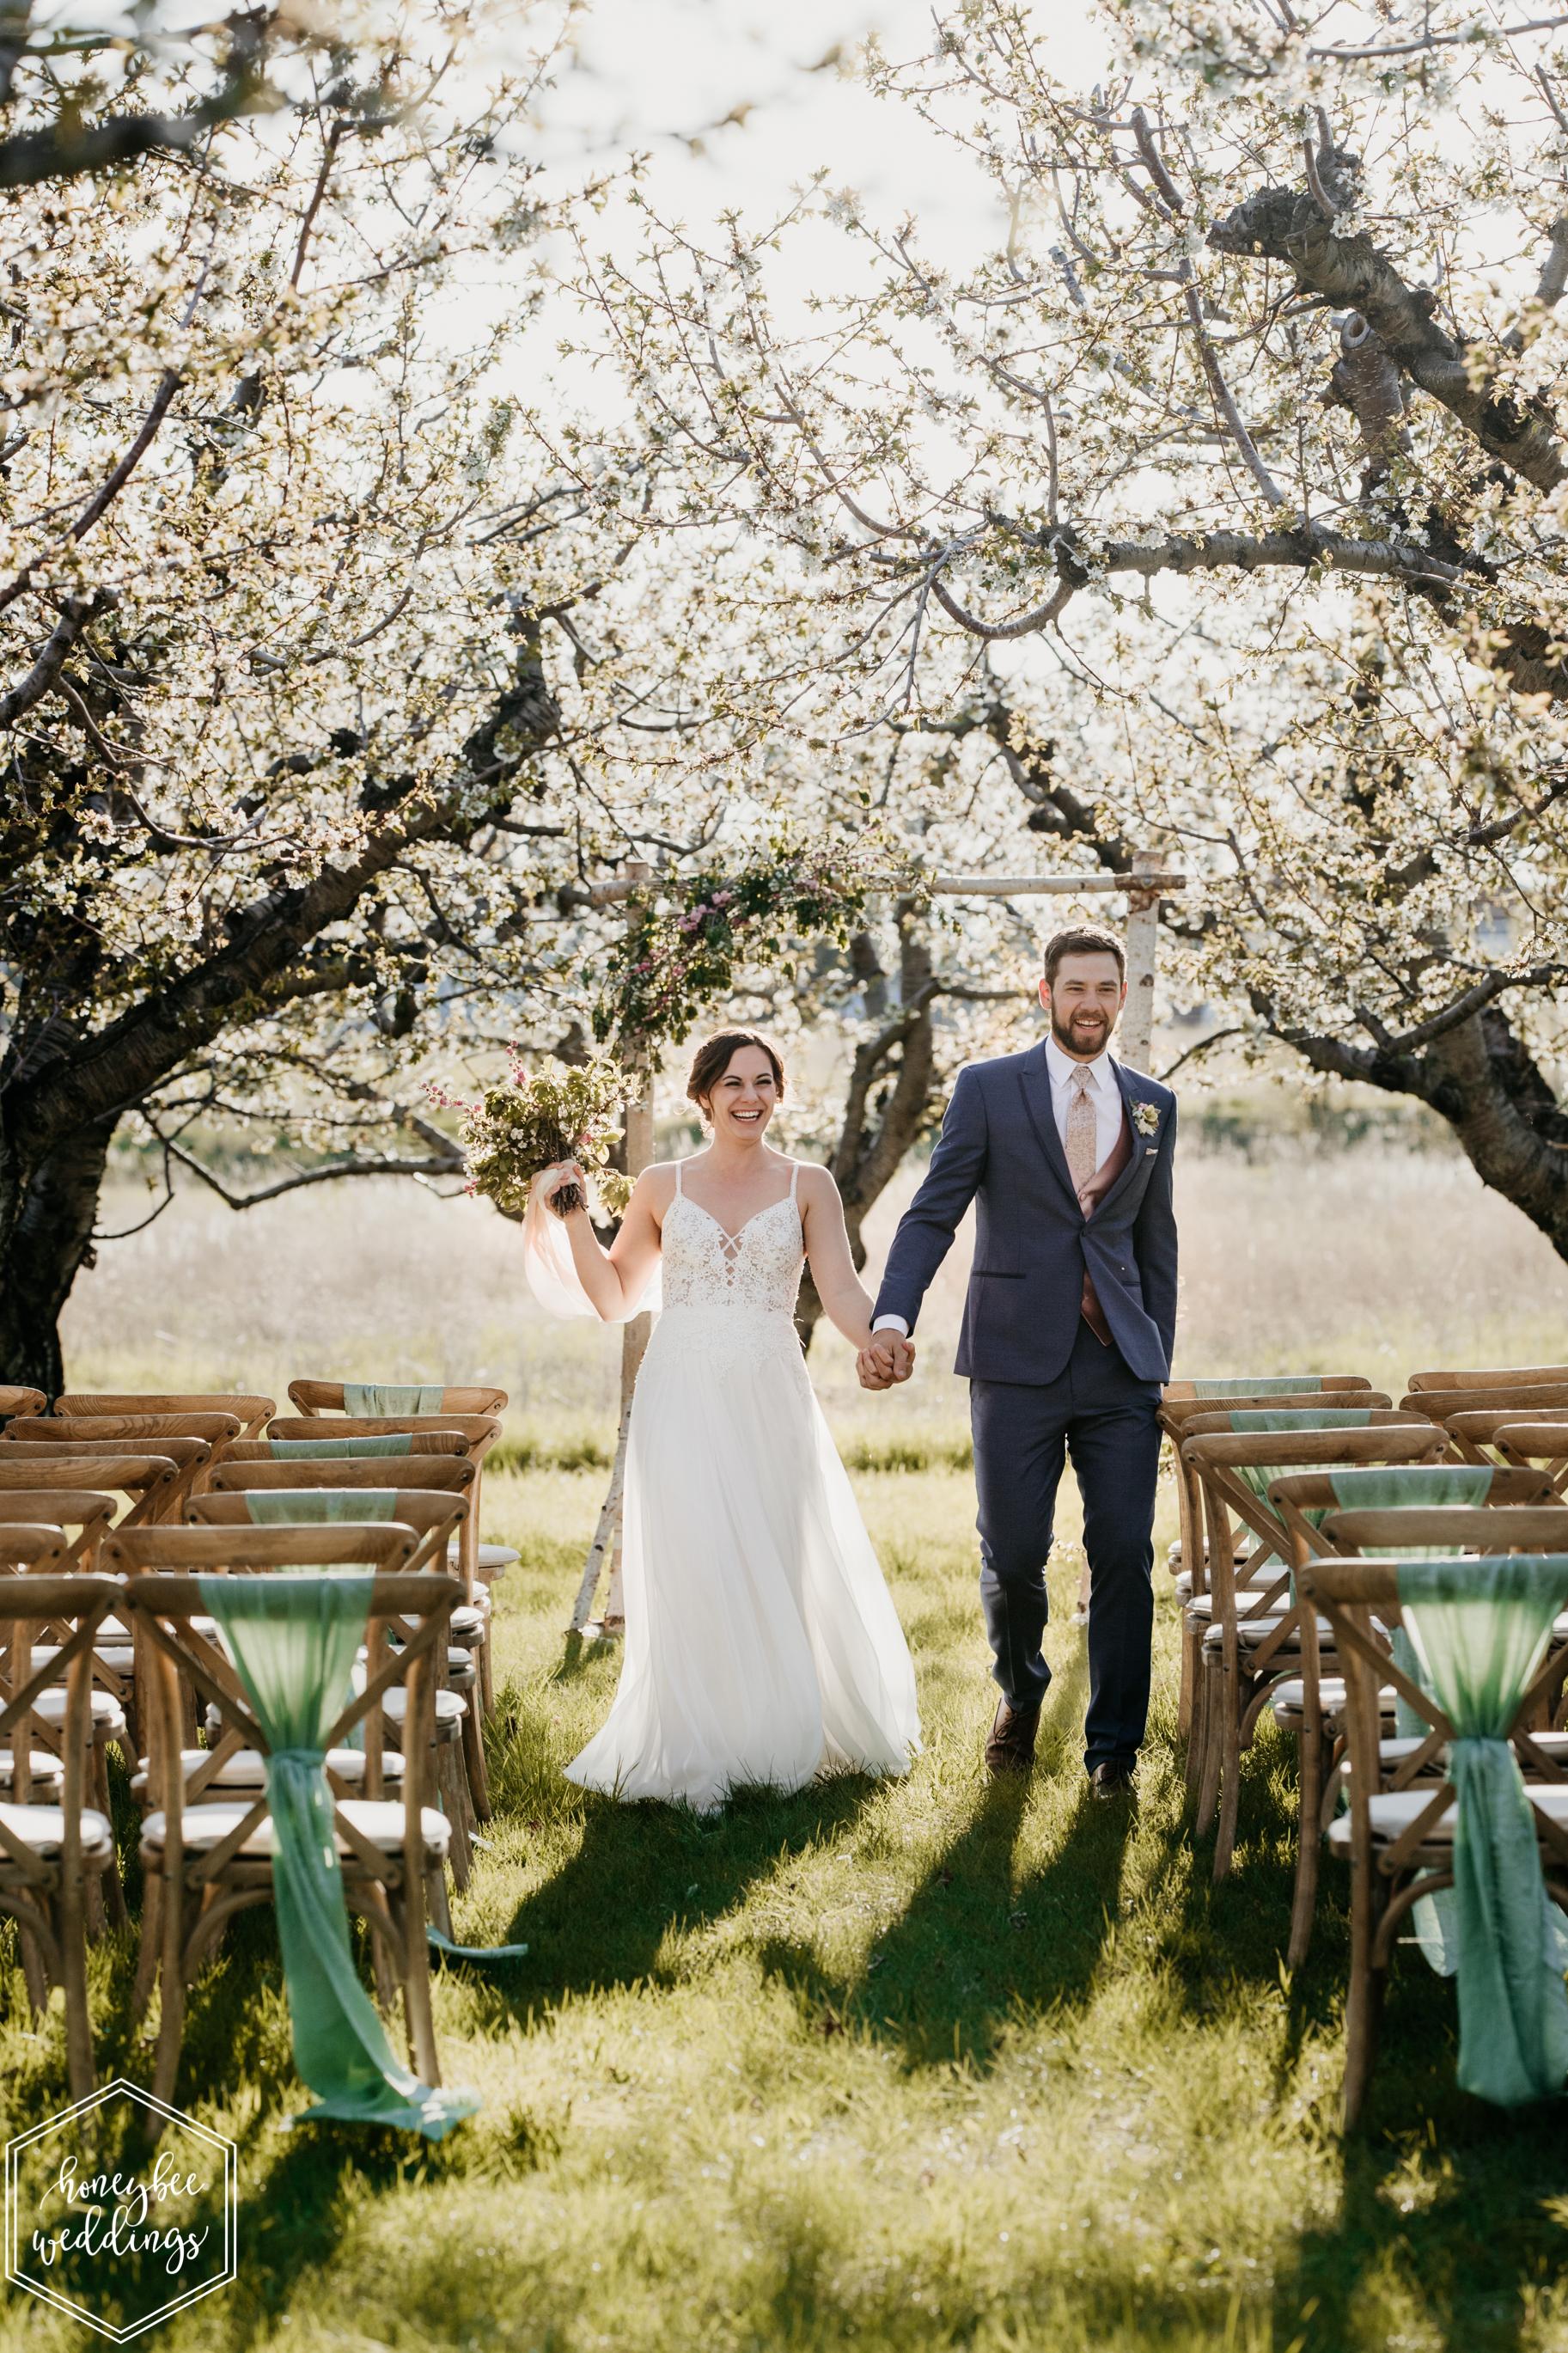 060Cherry Blossom Wedding_Styled Photoshoot_Honeybee Weddings_May 11, 2019-463.jpg